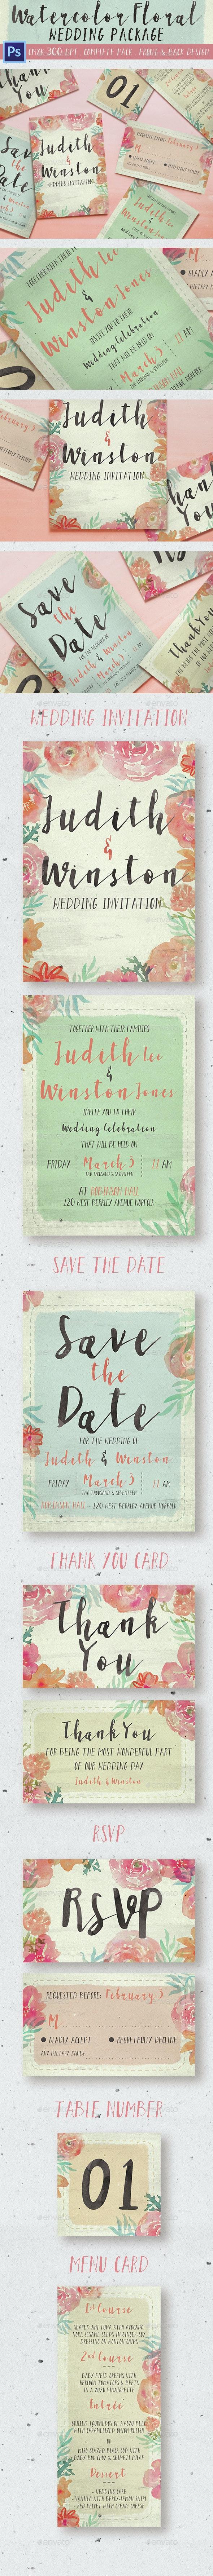 Watercolor Floral Wedding Package - Weddings Cards & Invites